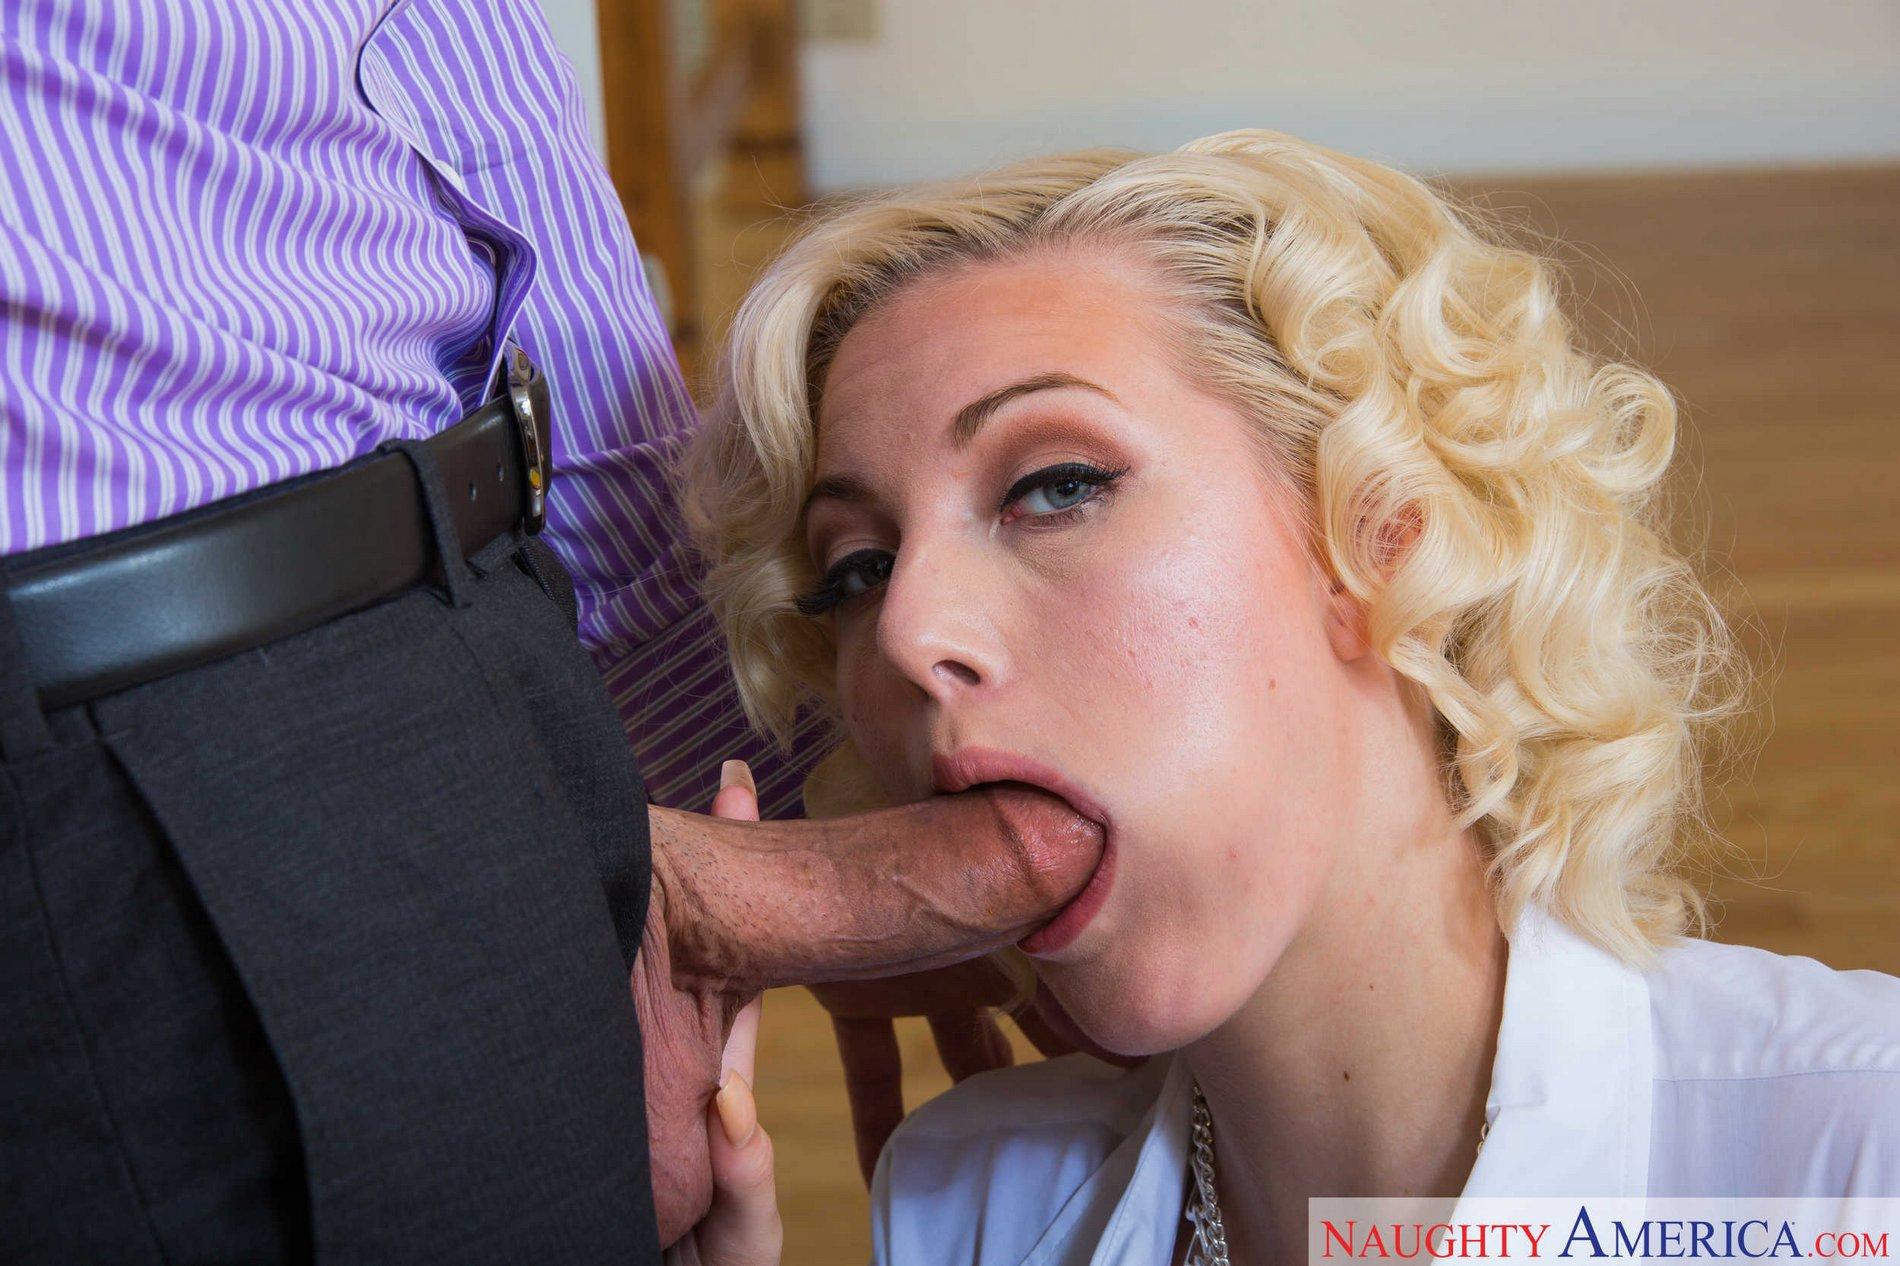 Naughty schoolgirl jenna ivory pounded by tutor